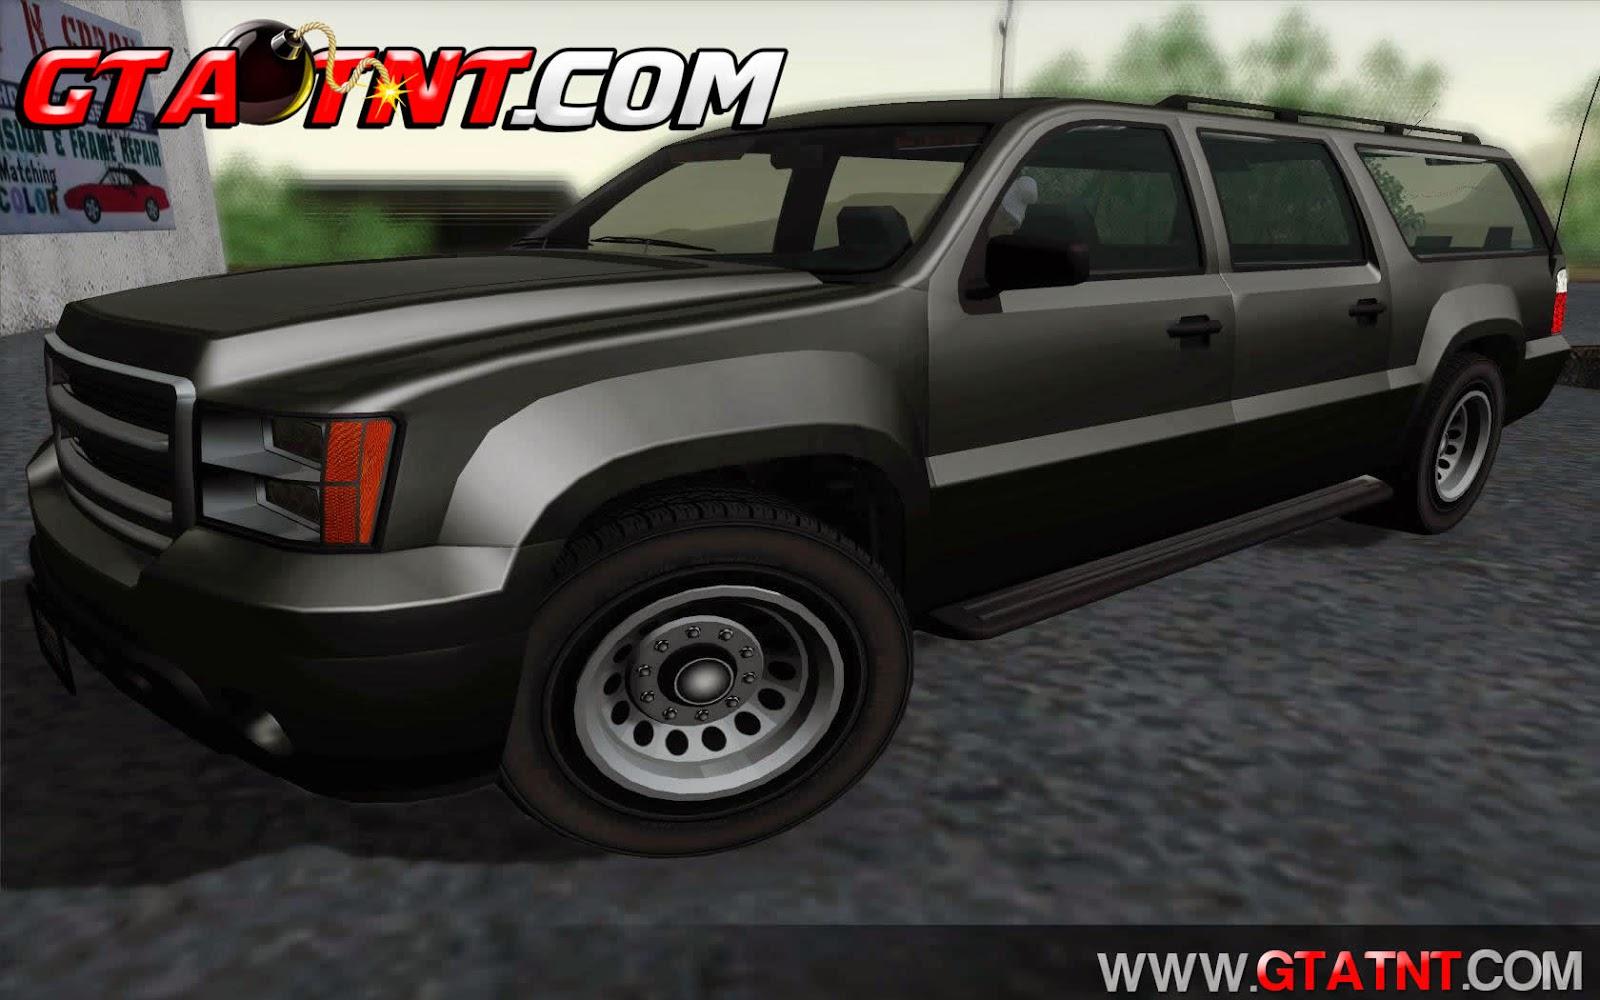 FIB Granger Convertido do GTA V para GTA San Andreas